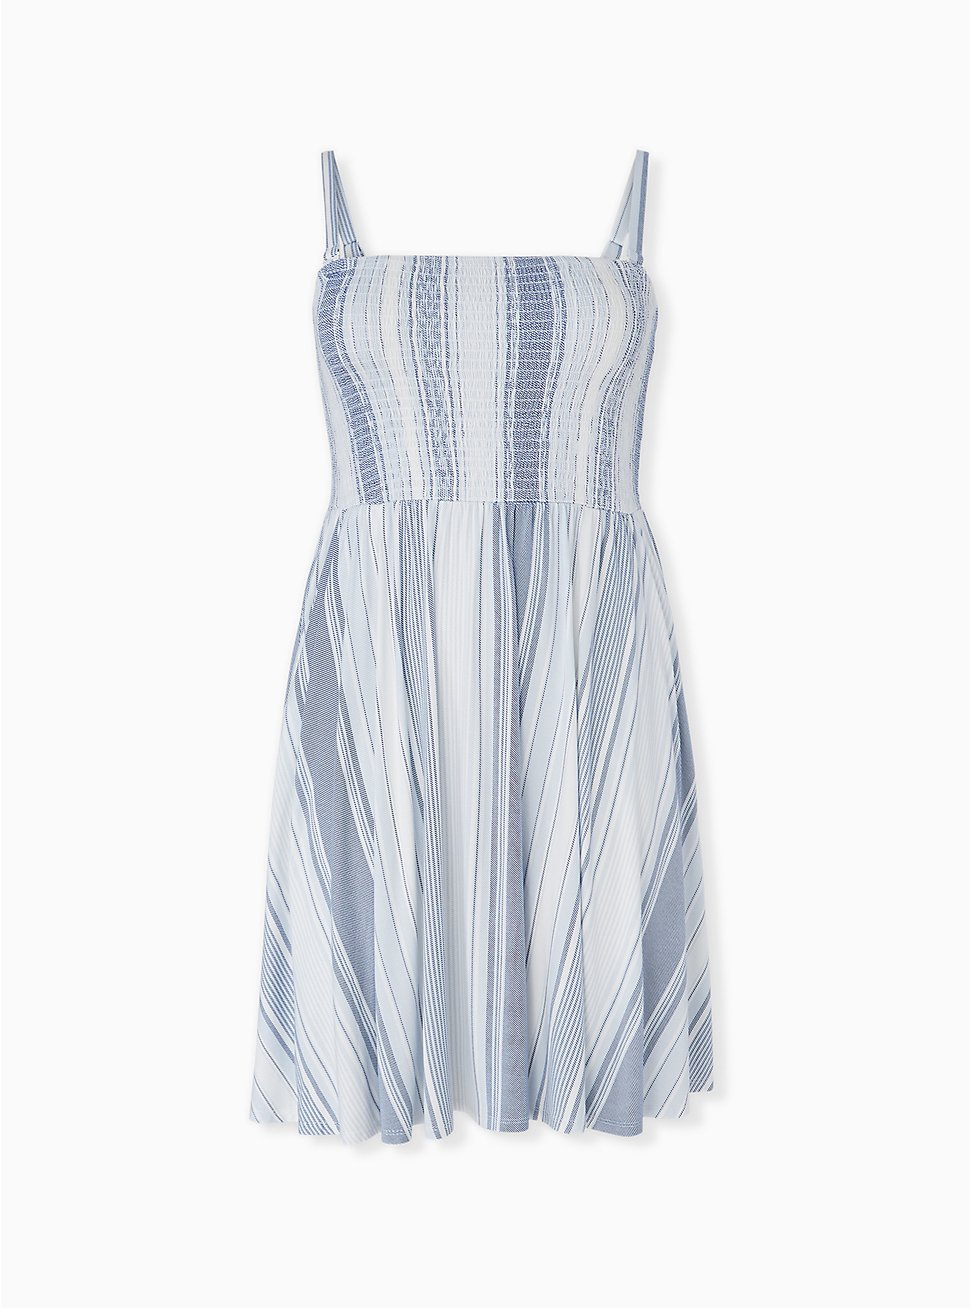 Super Soft Light Blue Stripe Strapless Skater Dress, STRIPE - BLUE, hi-res